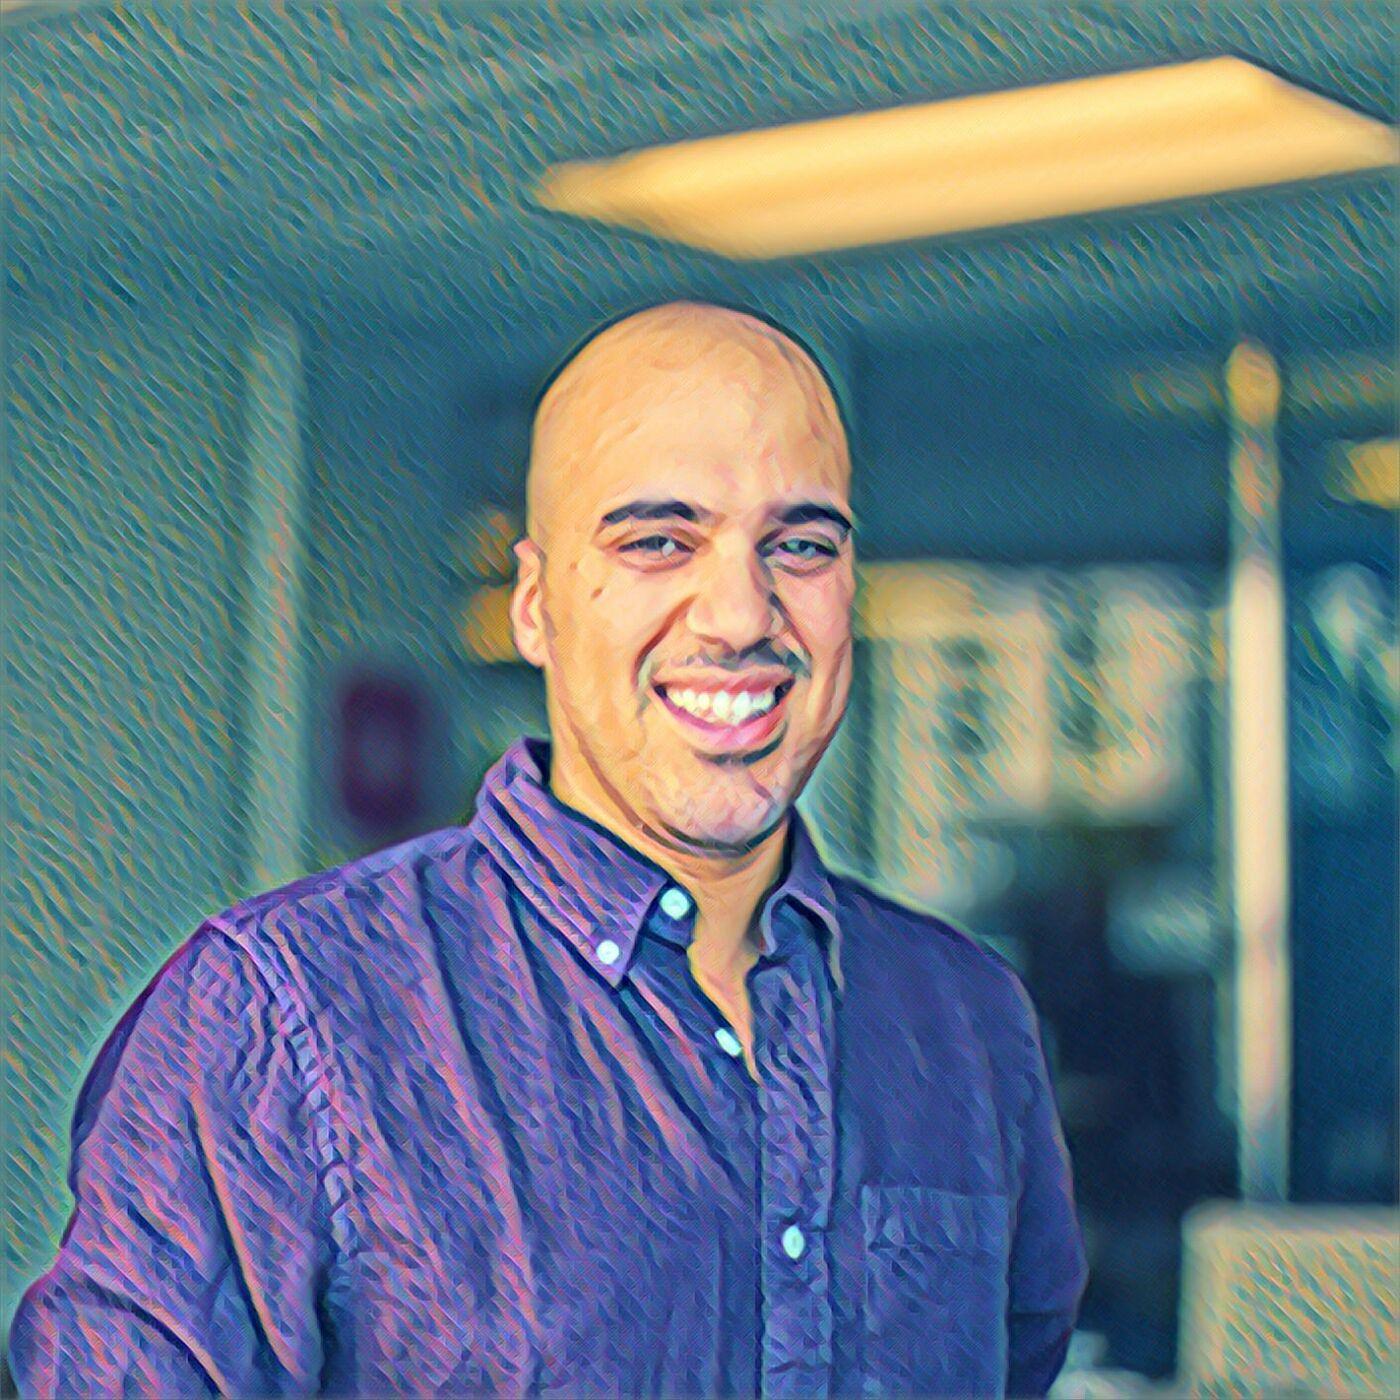 Winning with Product Led Growth - Dan Adika (Co-founder & CEO, Walkme)